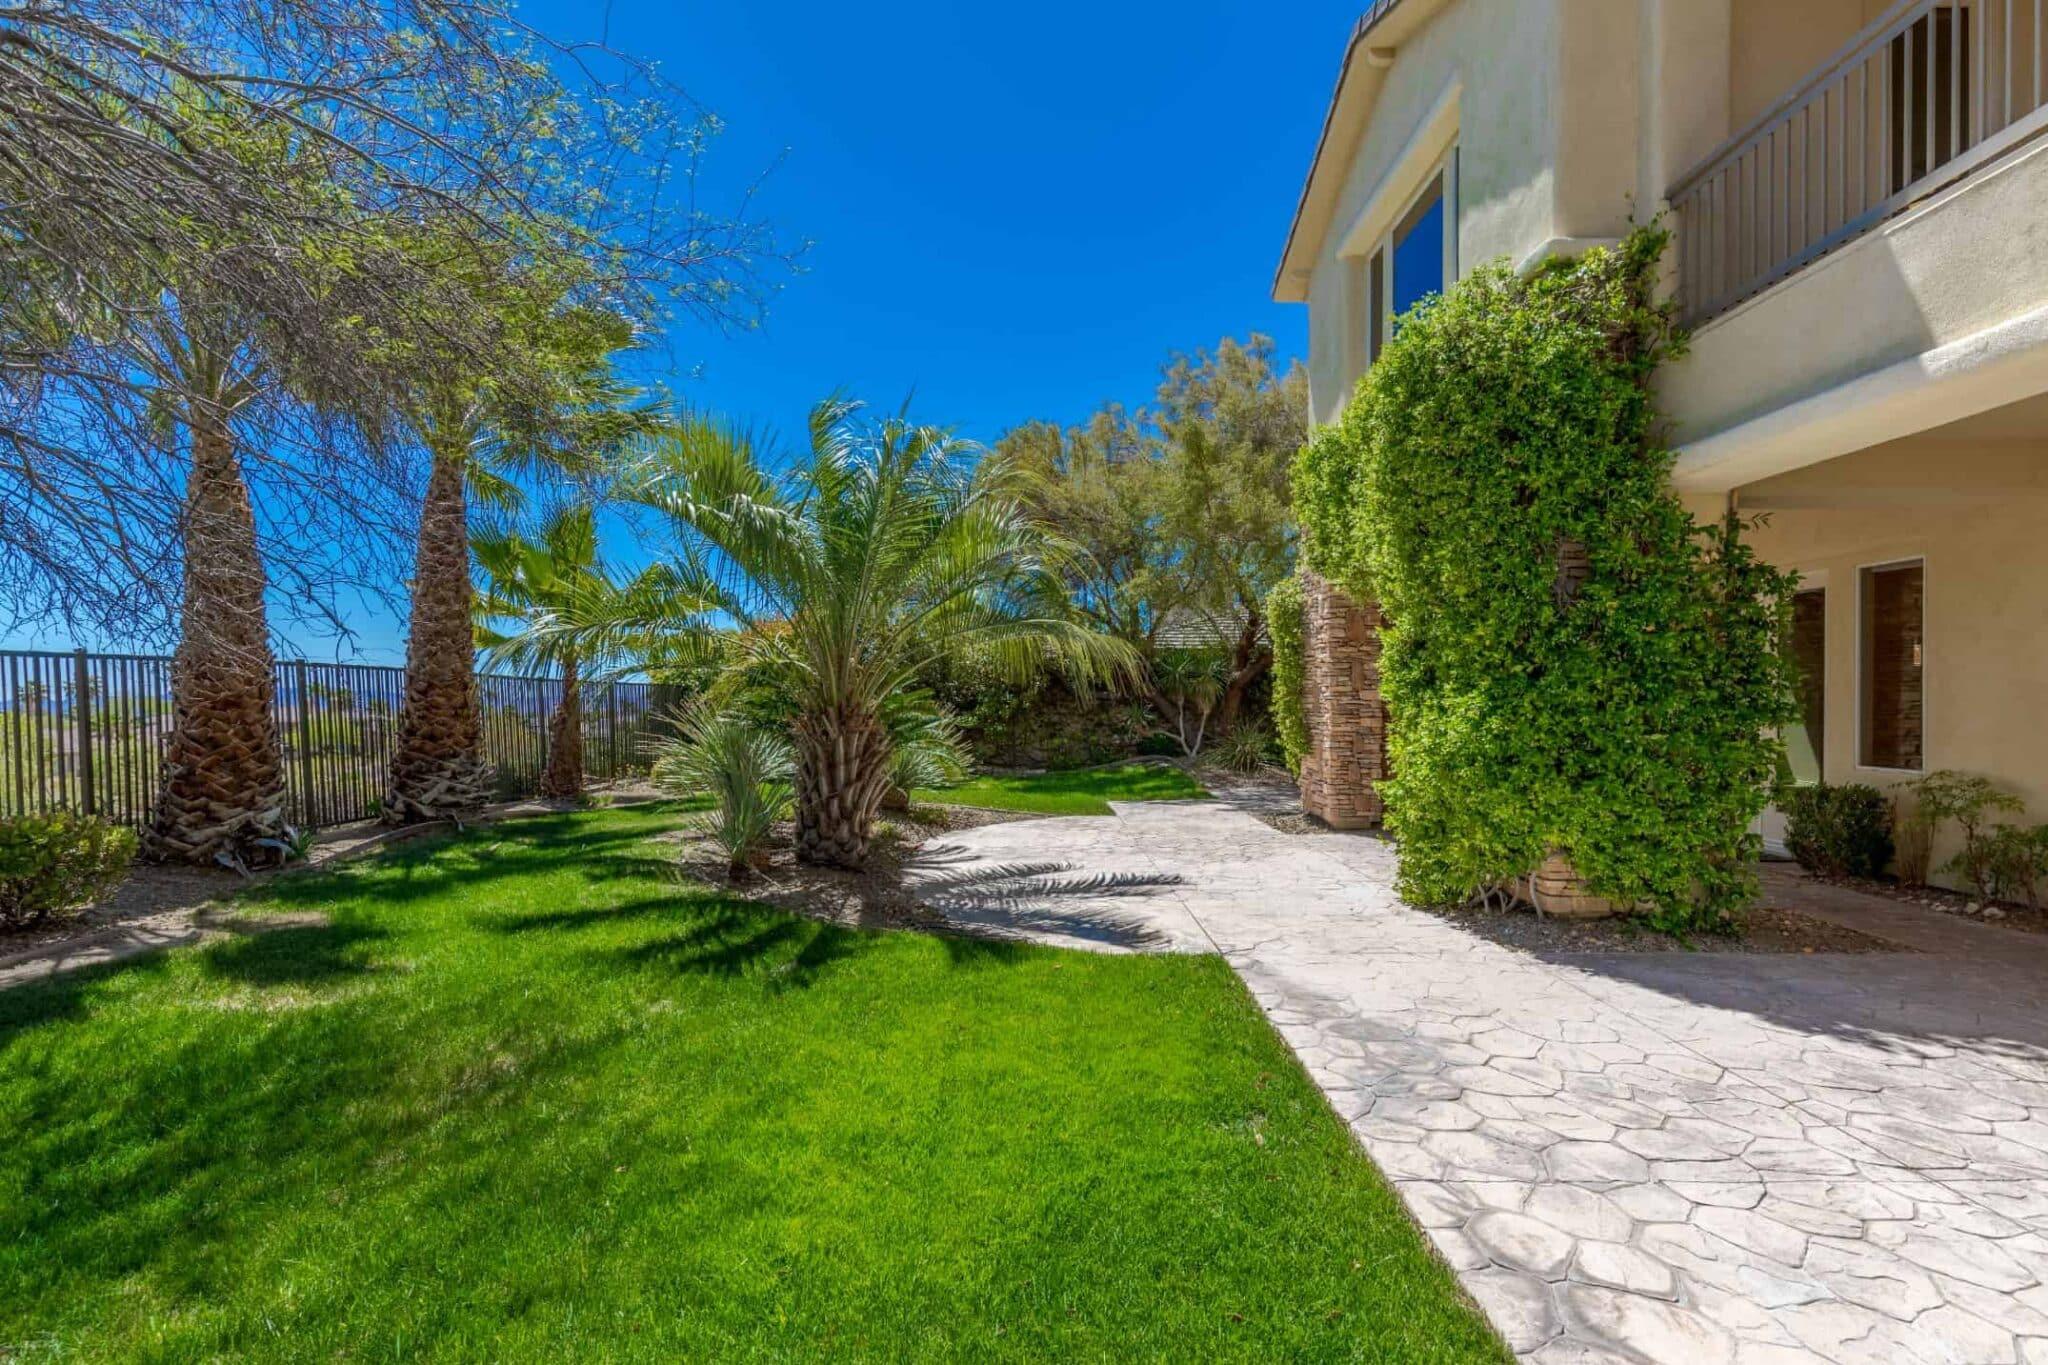 las-vegas-luxry-real-estate-realtor-rob-jensen-company-2620-grassy-spring-place-rrcc56